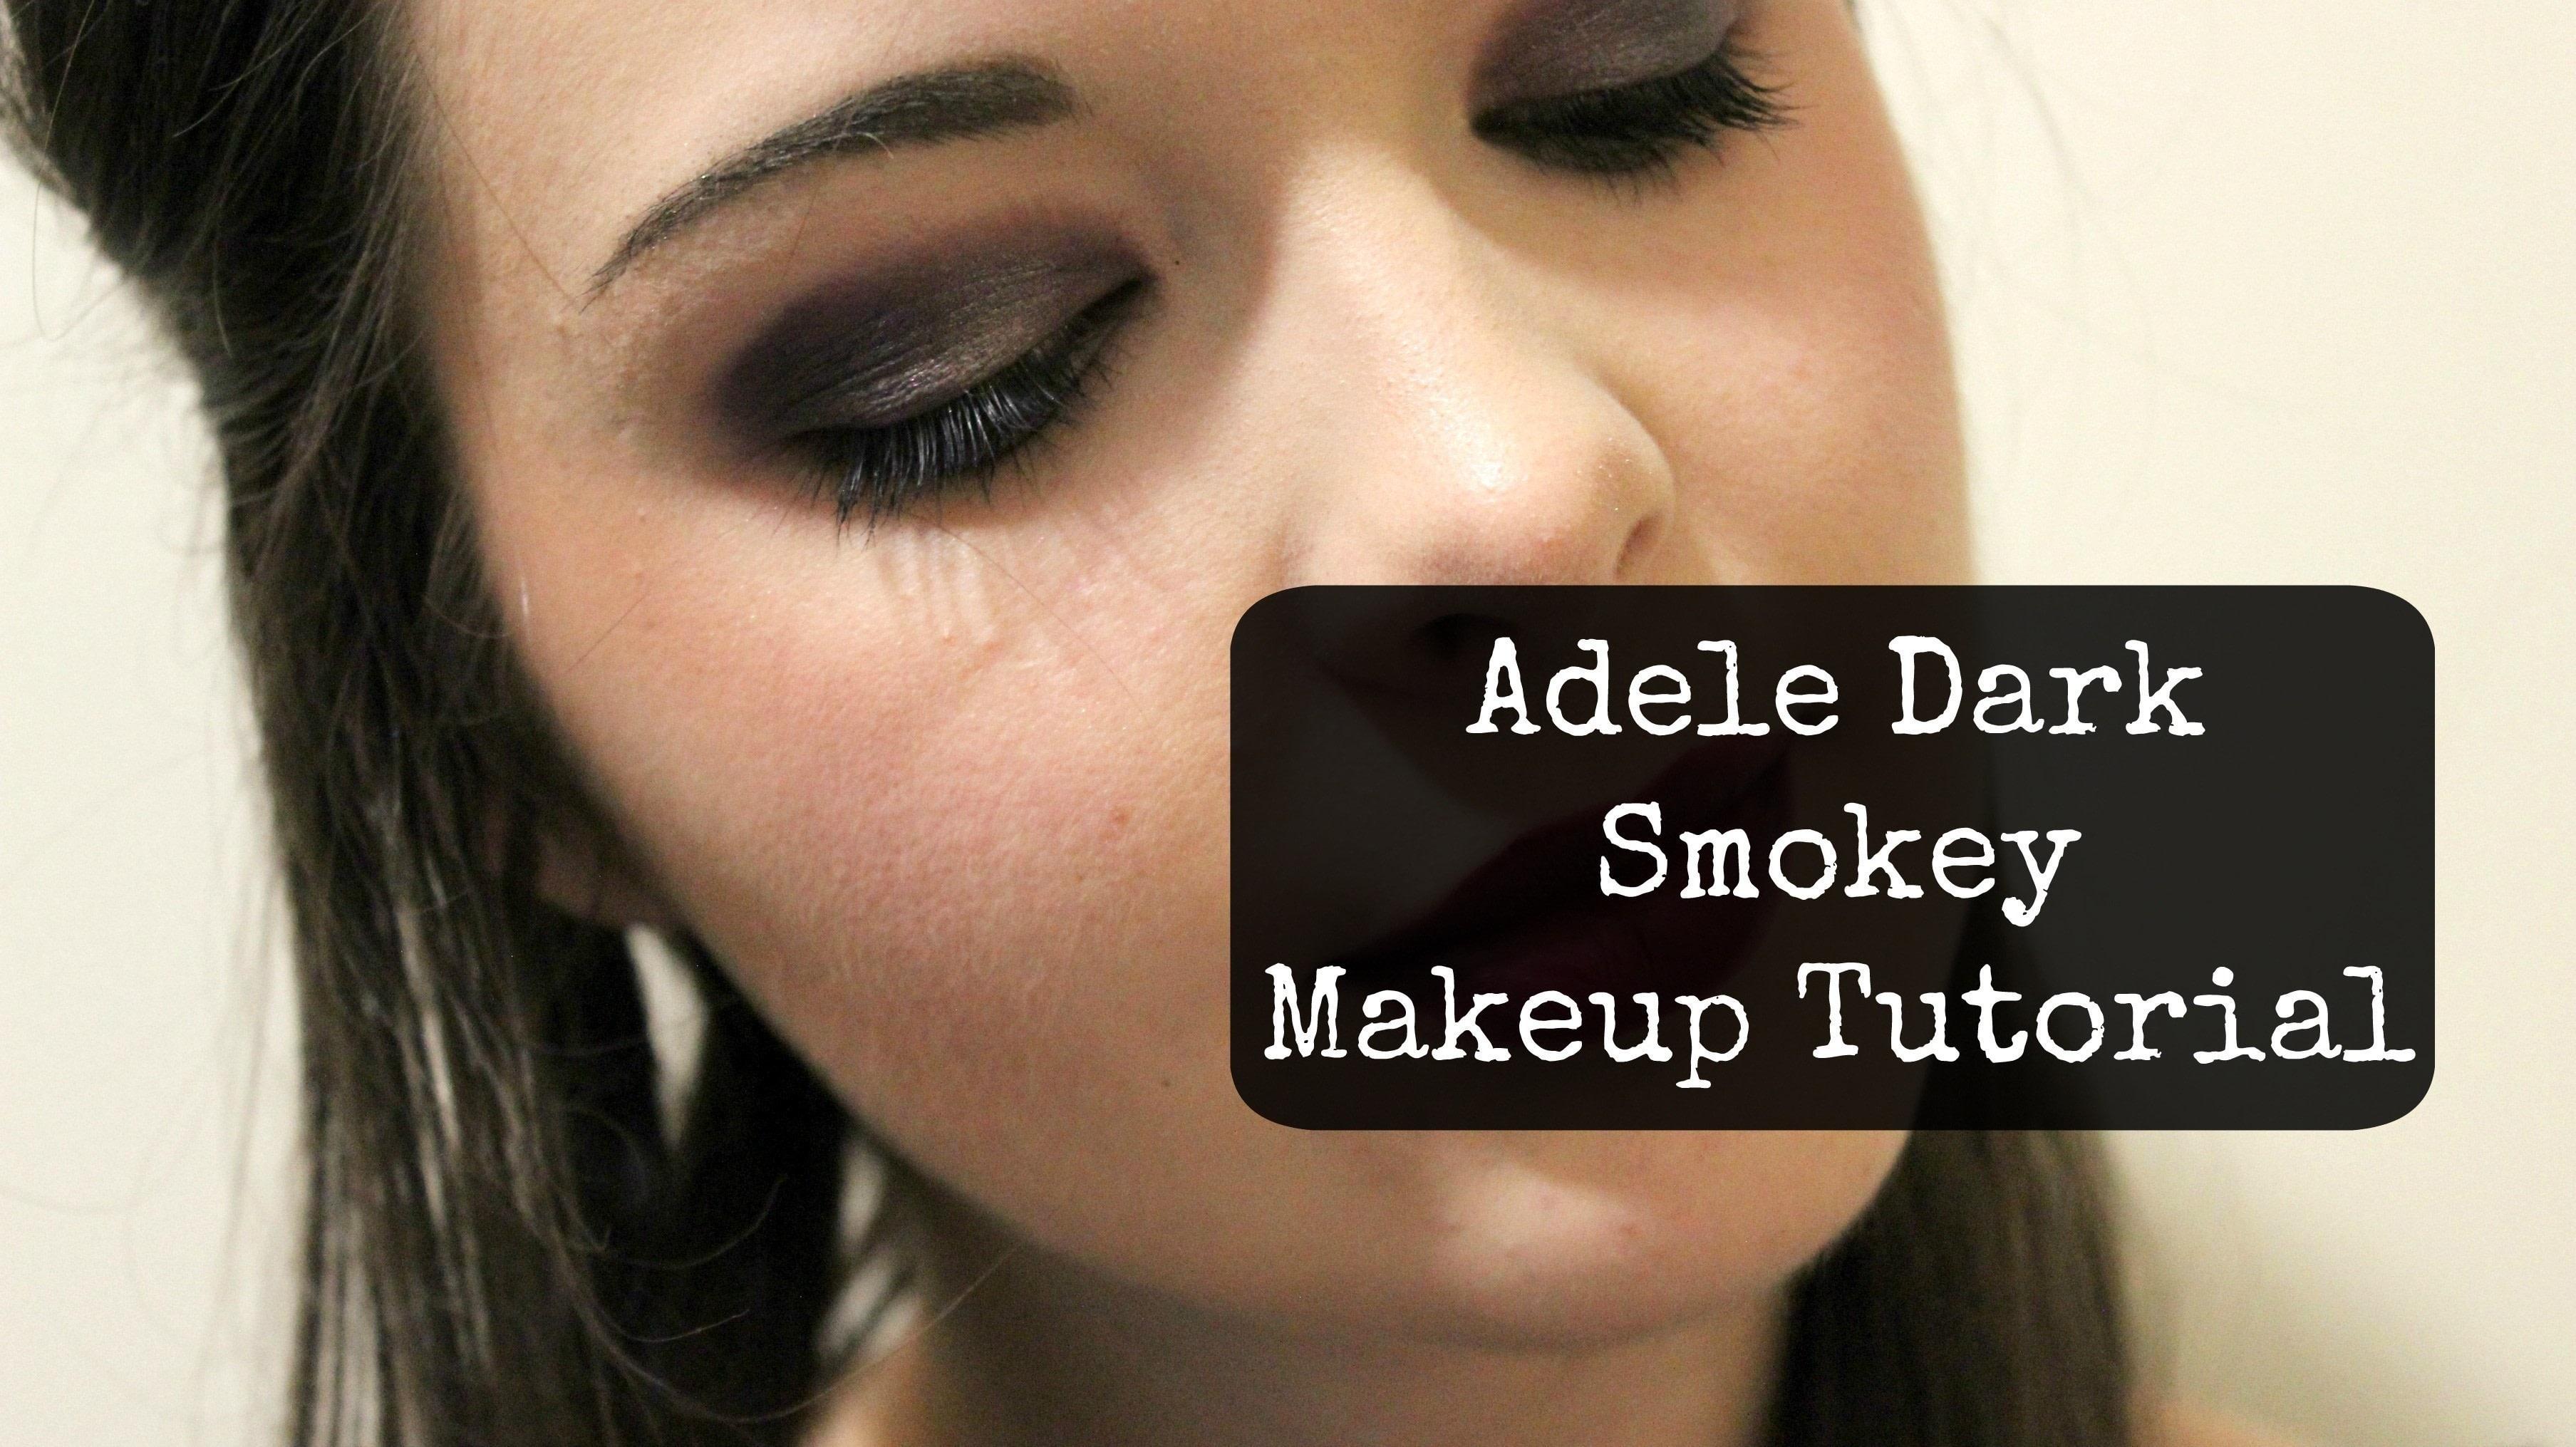 Adele Dark Smokey Makeup Look How To Create A Smokey Eye Beauty On Cut Out Keep